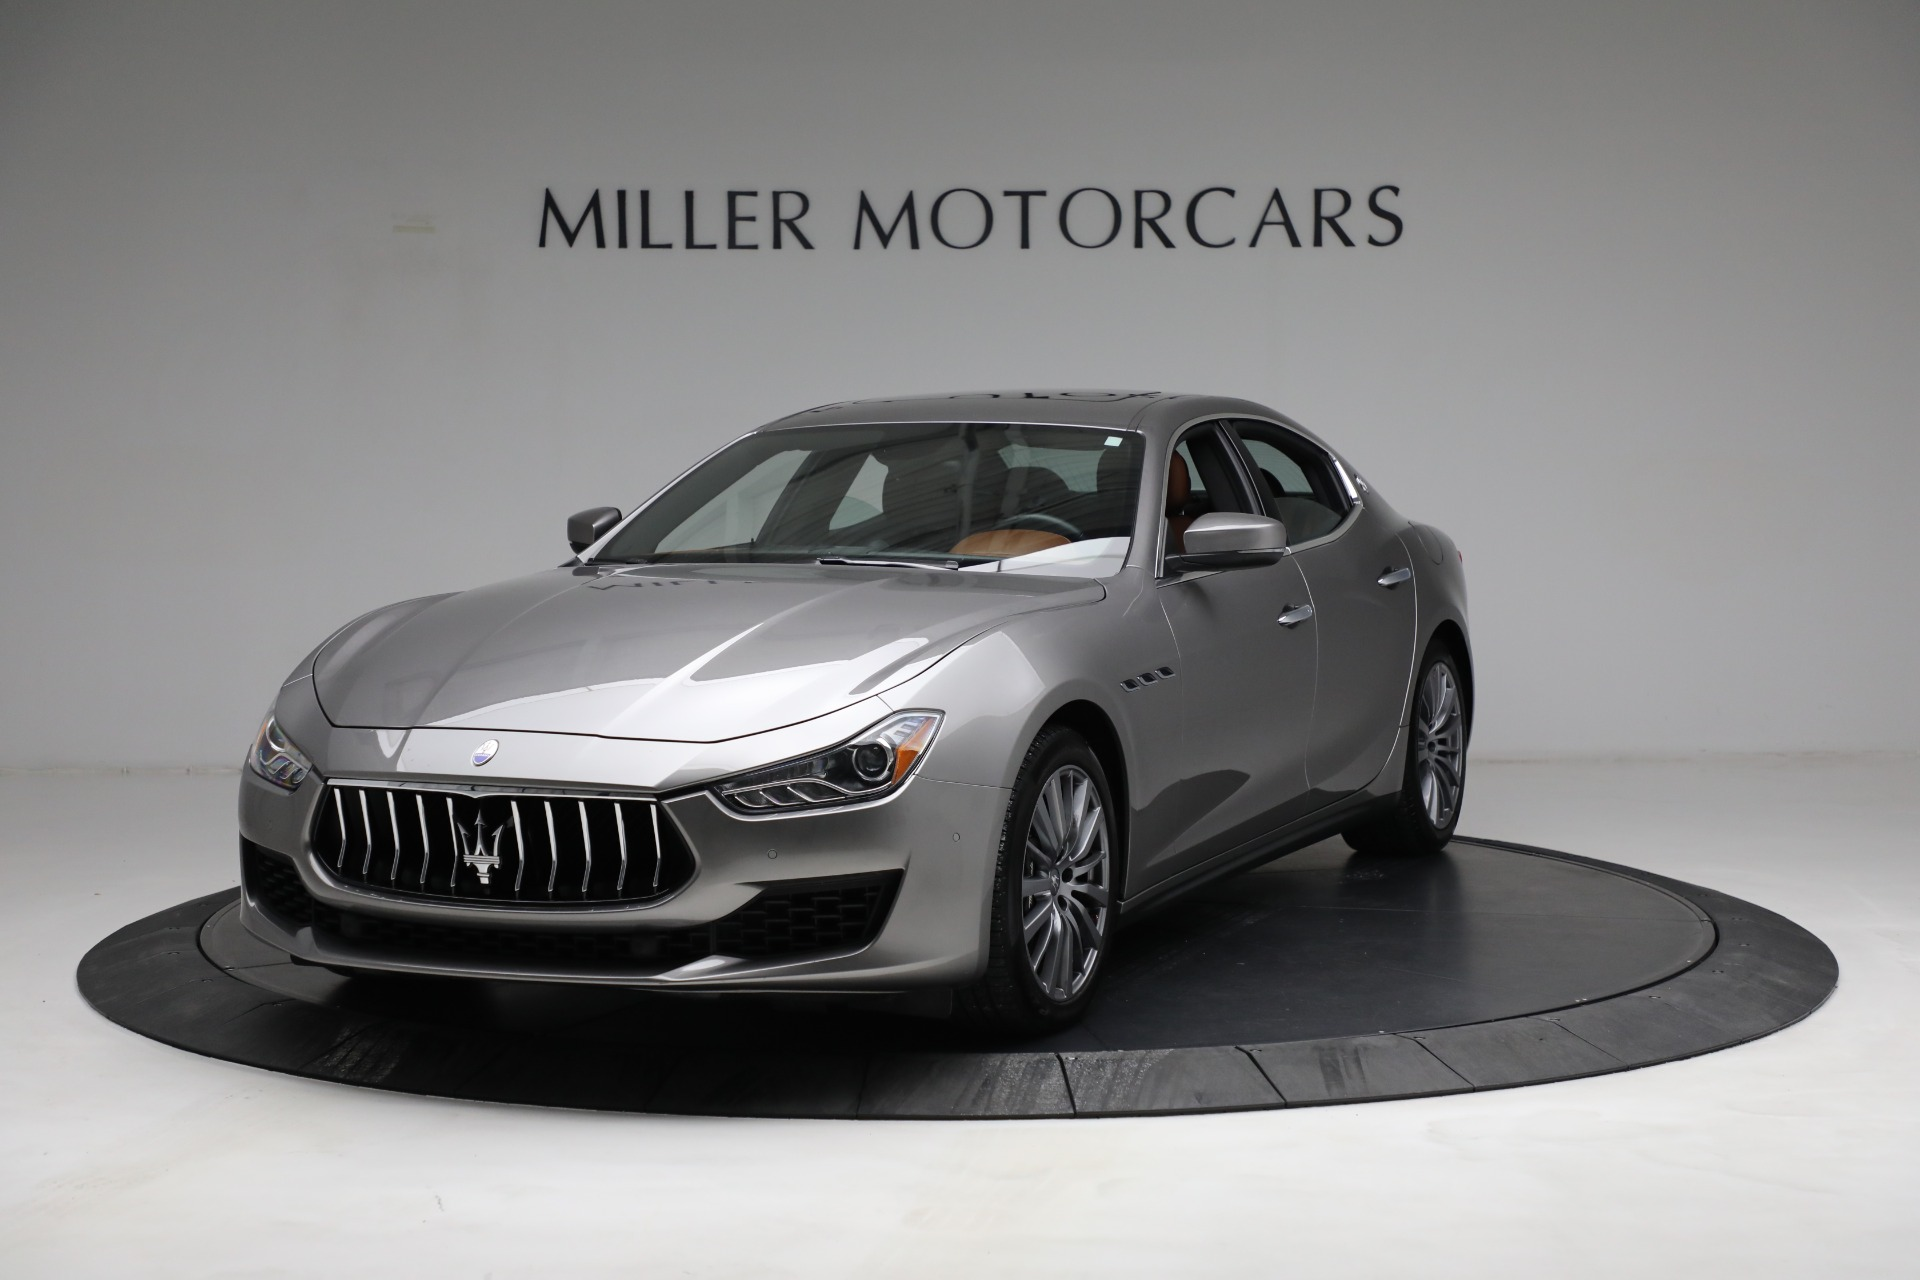 New 2018 Maserati Ghibli S Q4 For Sale In Greenwich, CT 1861_main